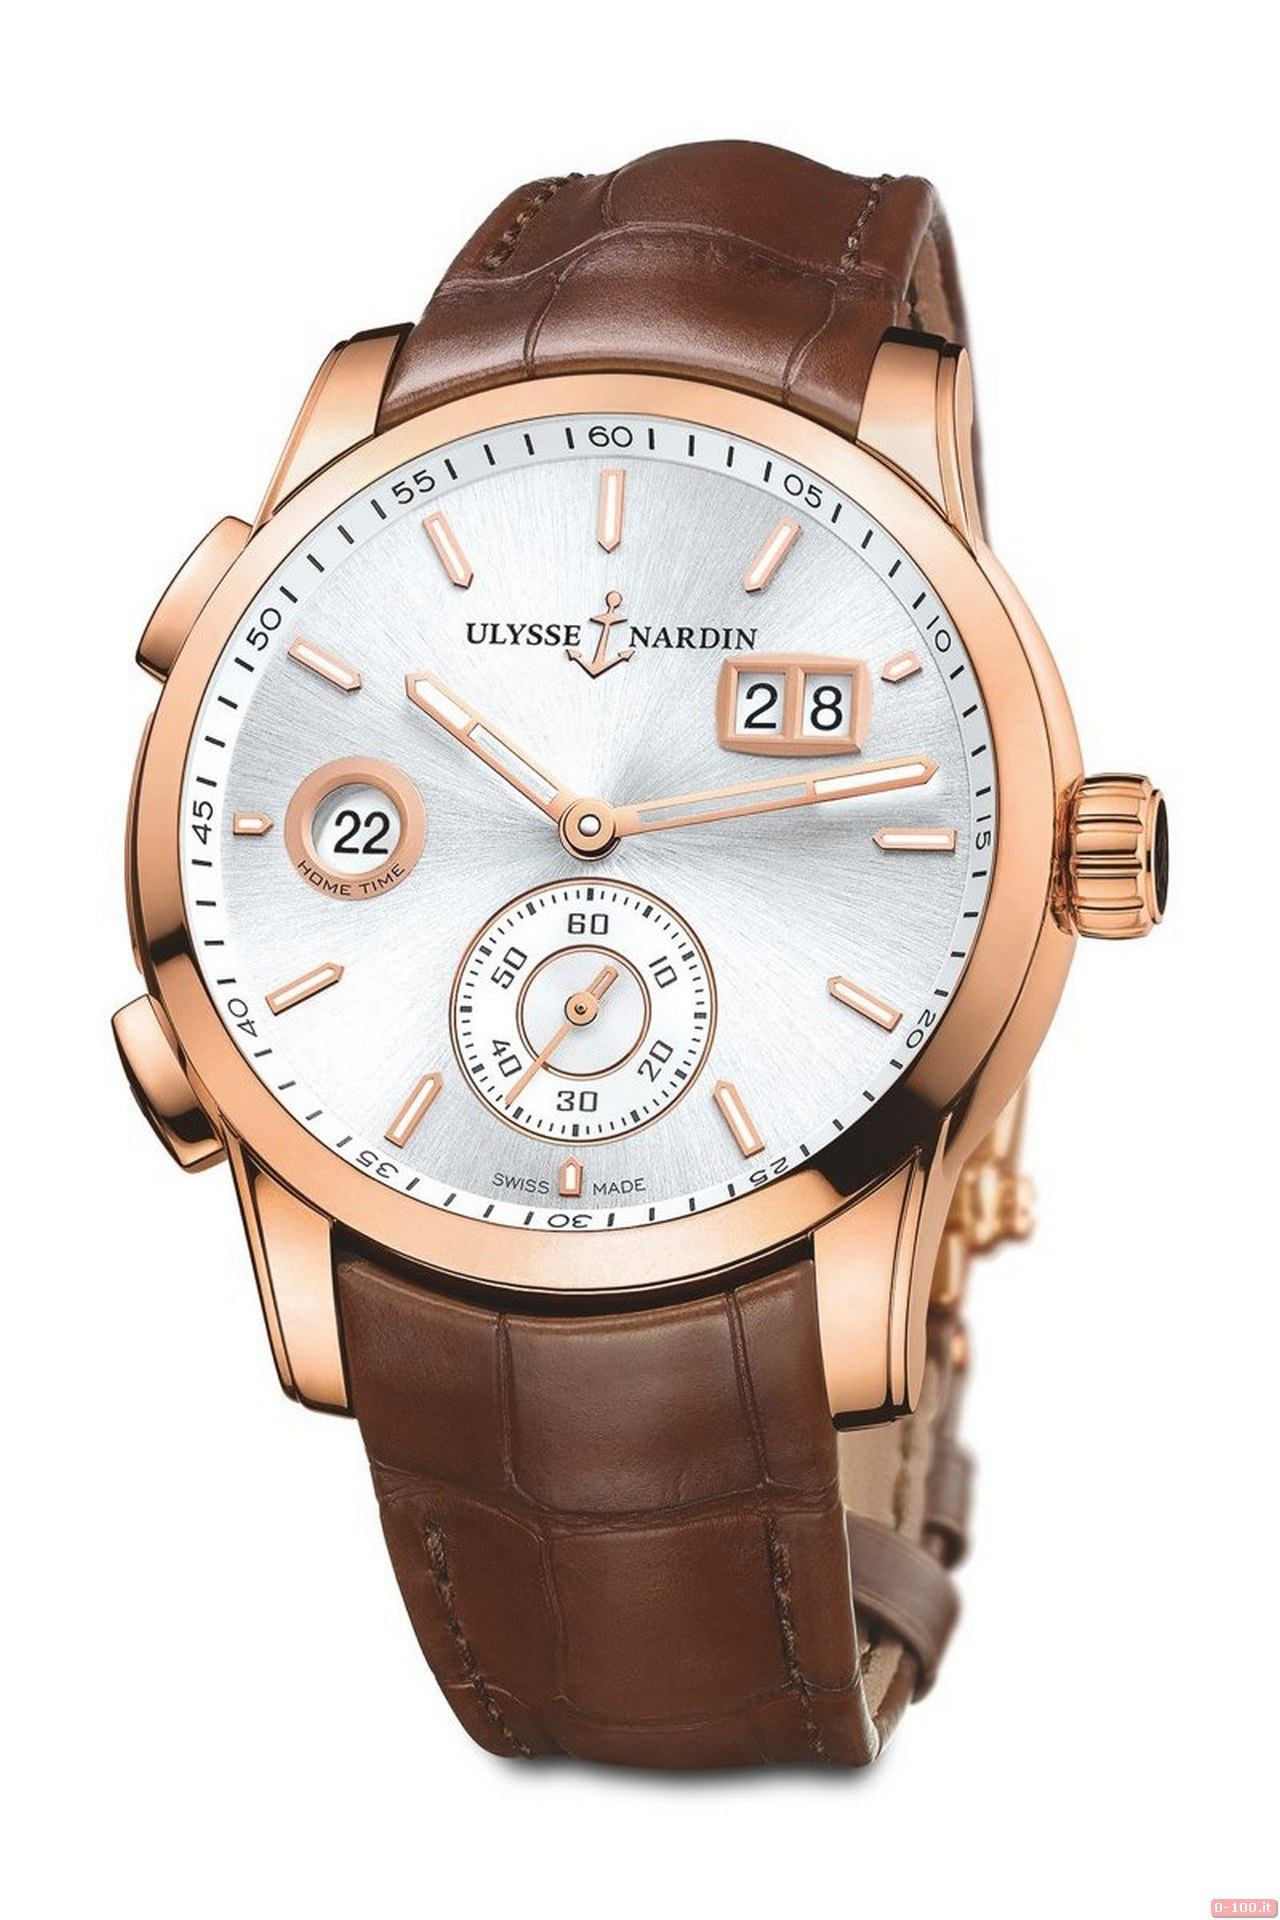 anteprima-baselworld-2014-ulysse-nardin-dual-time-manufacture_0-1002